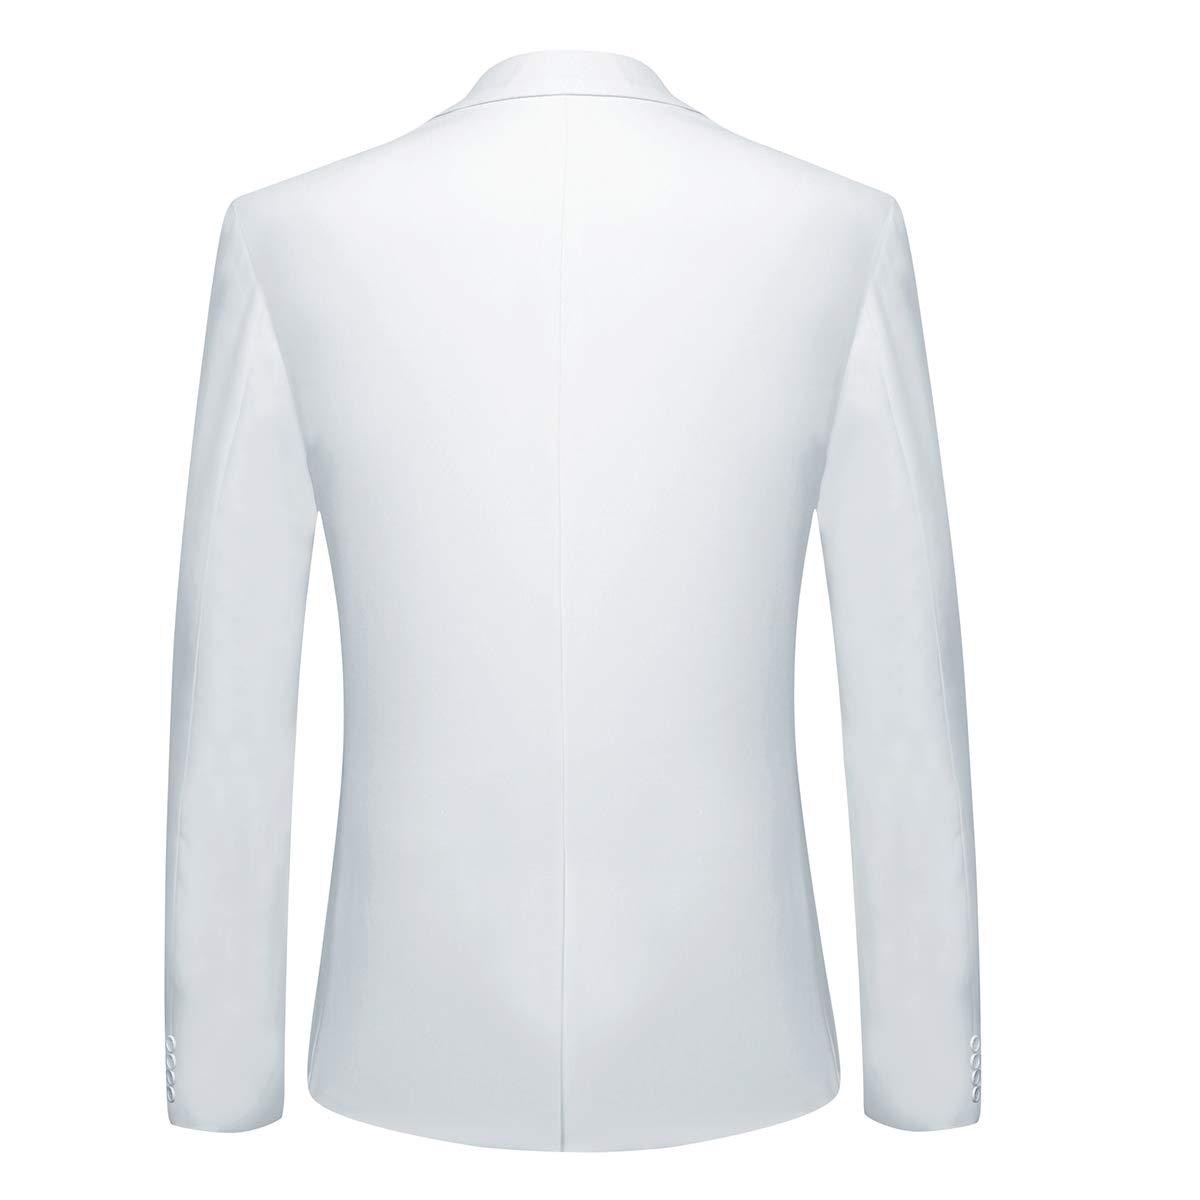 Hombre Youthup Traje Para Hombres Blazer Y Pantalones Elegantes Trajes Para Hombre De Vestir Ropa Grupobrtelecom Com Br